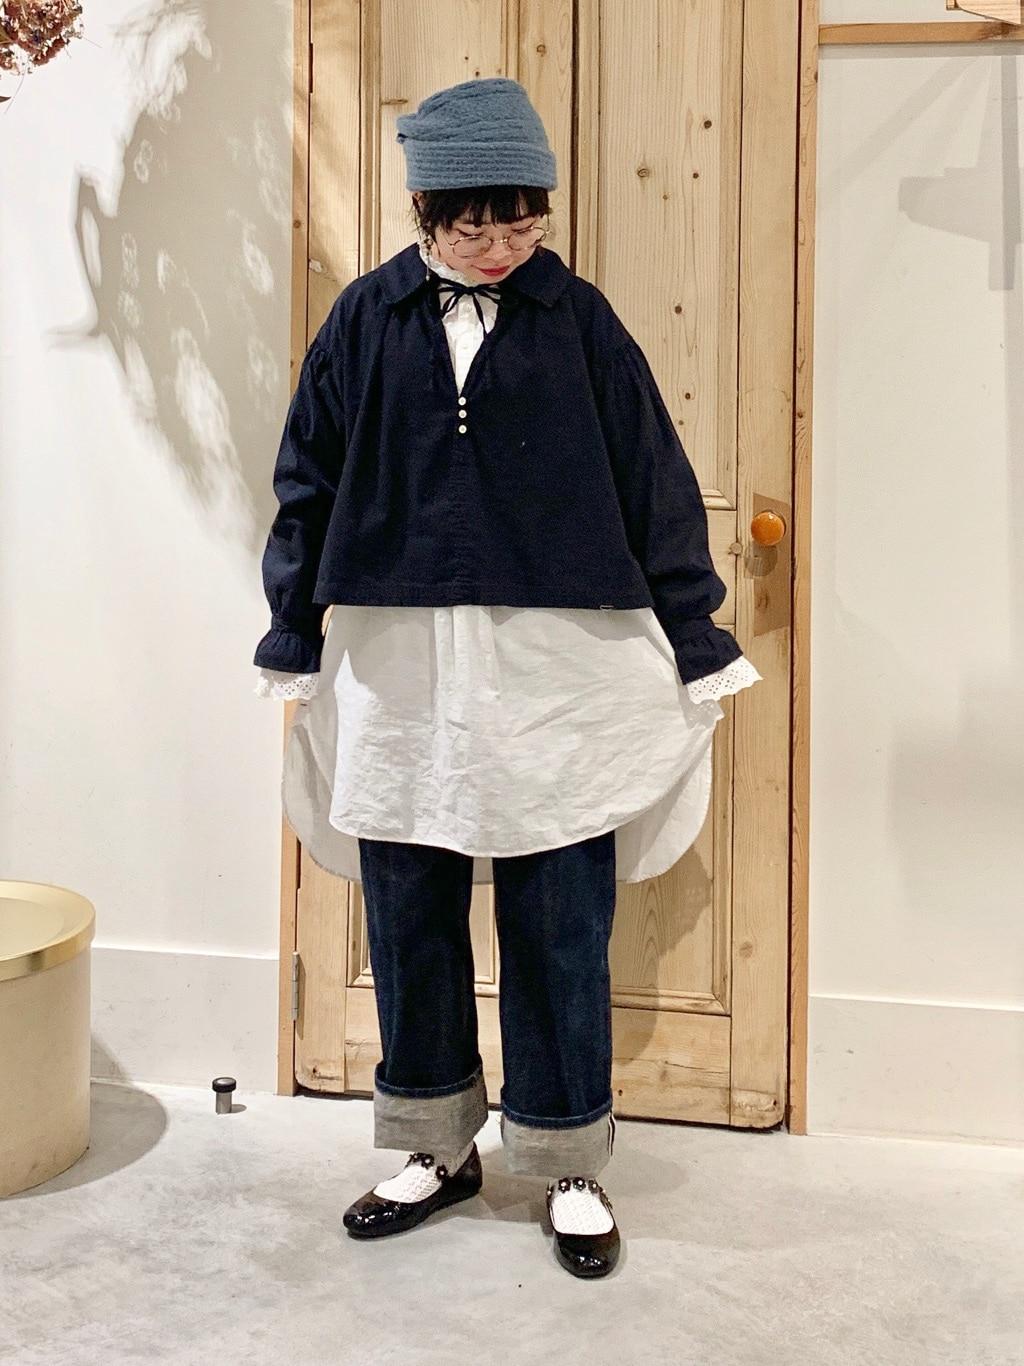 Malle chambre de charme 調布パルコ 身長:153cm 2021.01.26